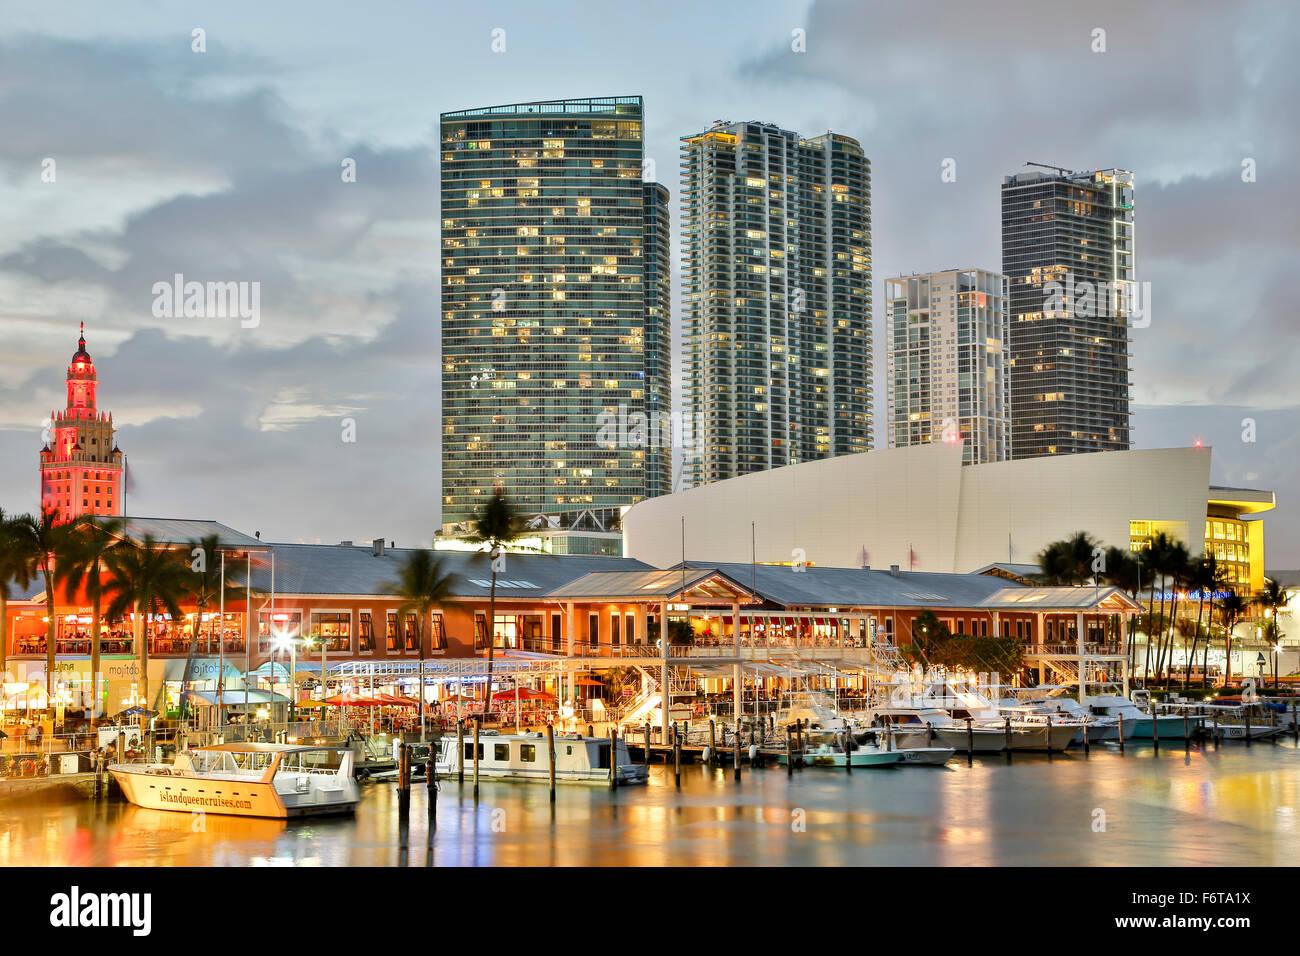 Marina at Bayfront Marketplace and skyscrapers, Miami, Florida USA - Stock Image